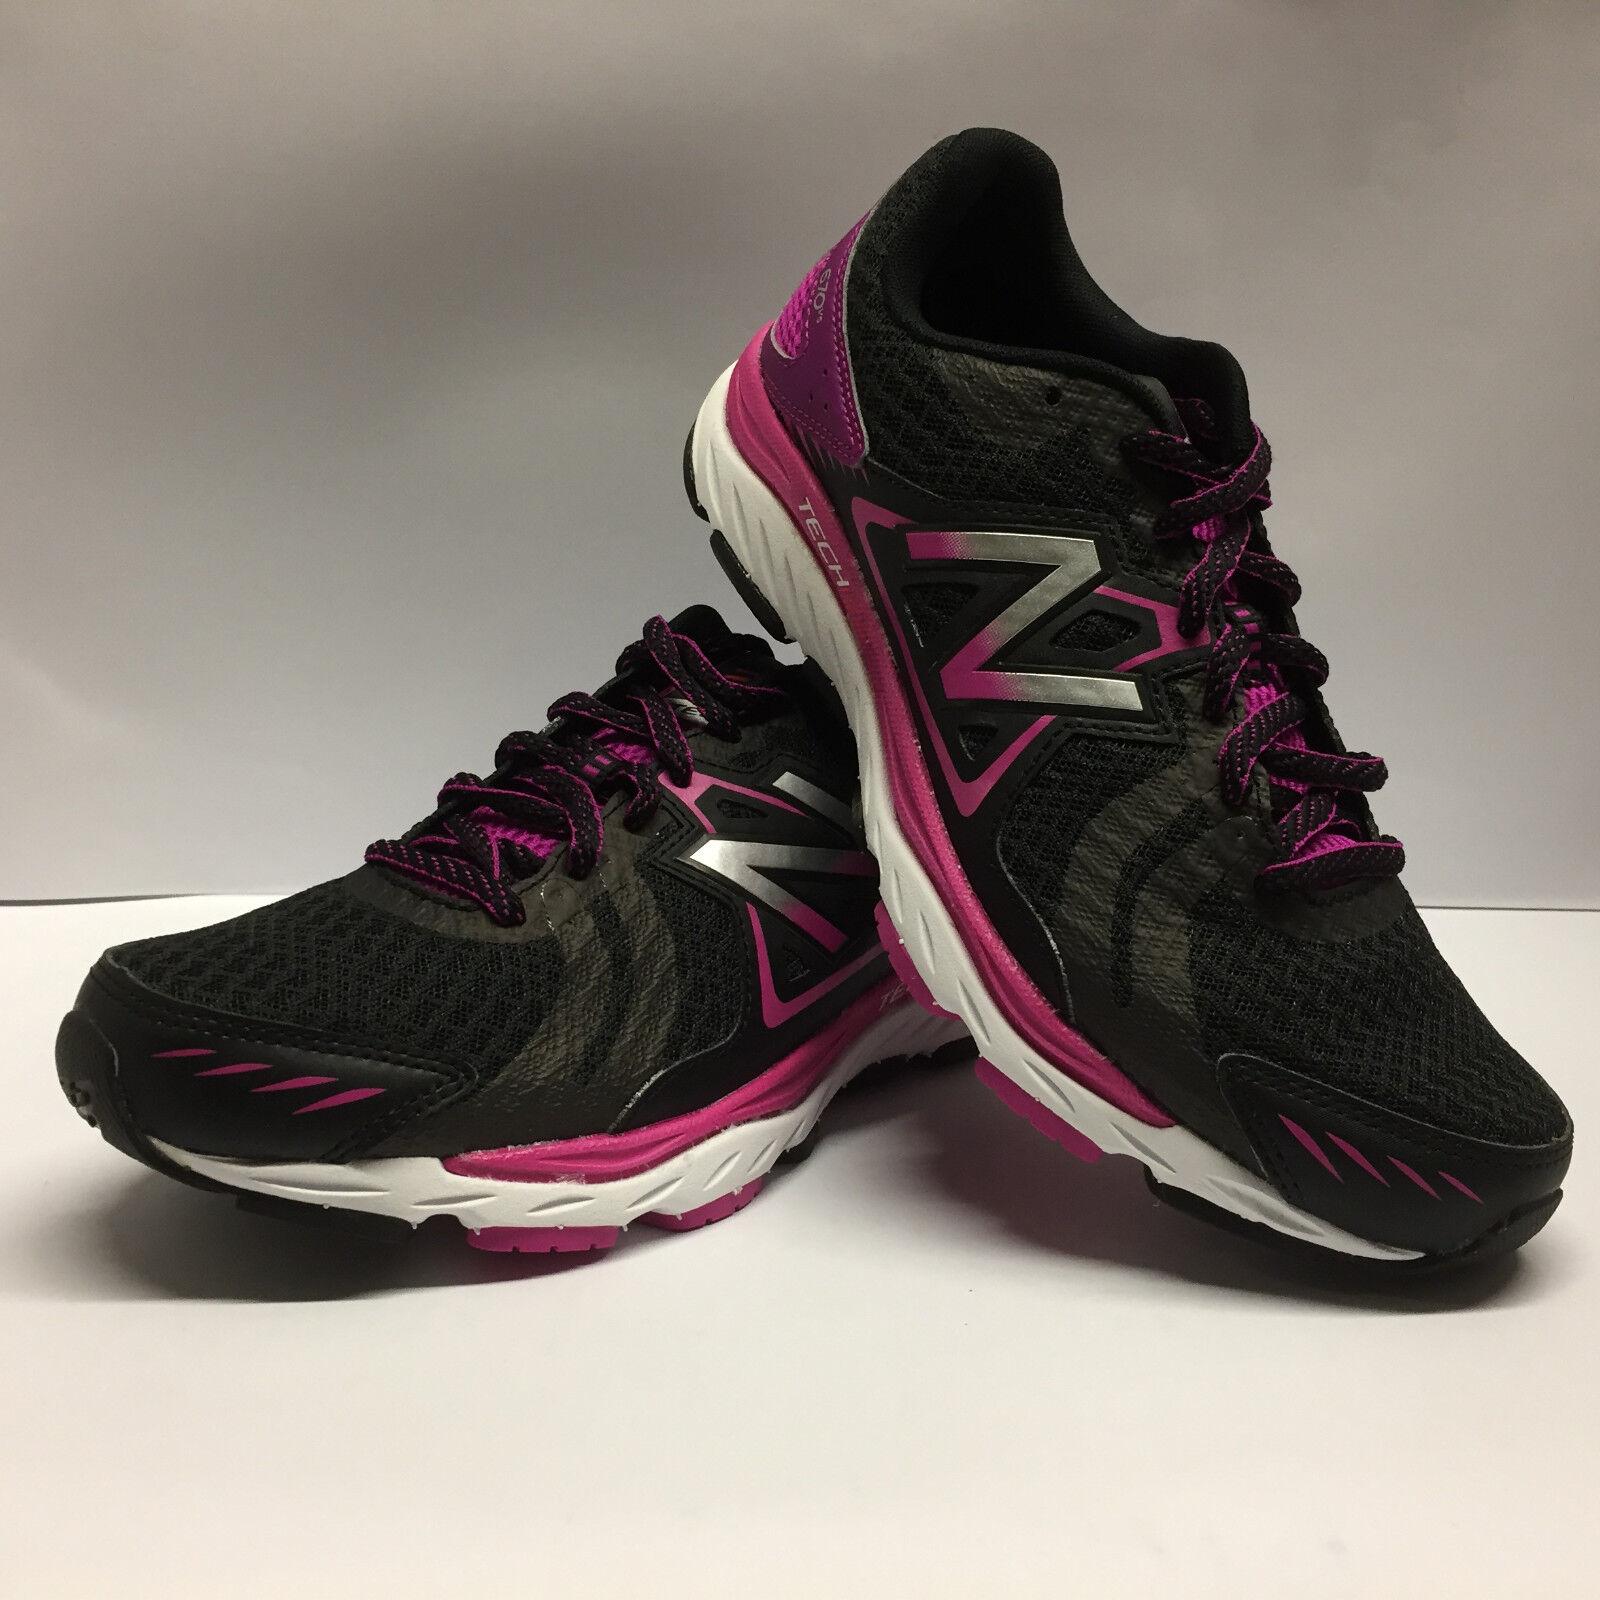 New Balance 670BK5 Women's Running shoes Black Pink